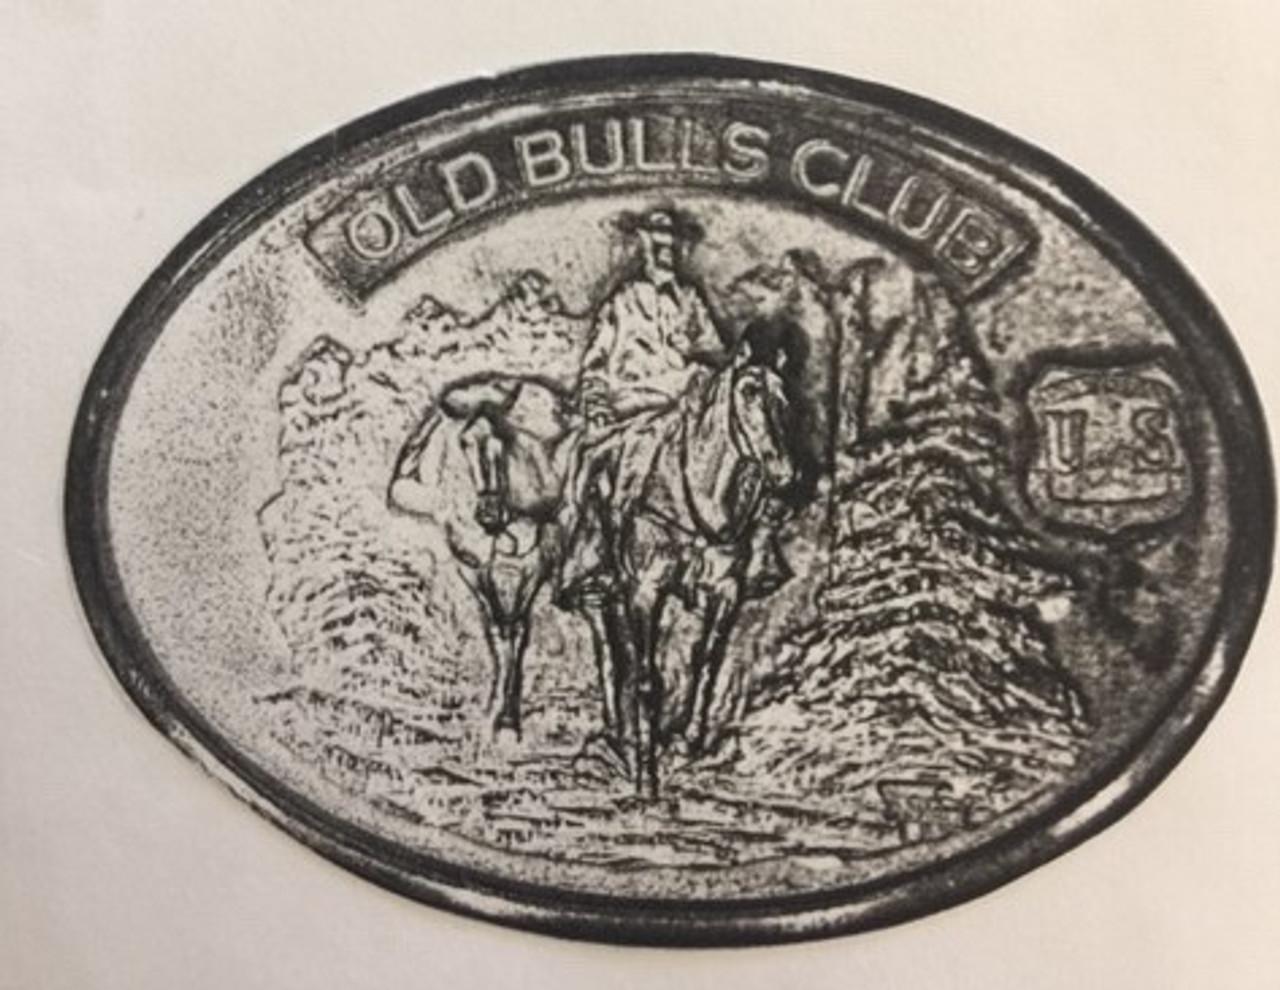 Old Bulls Club Buckle